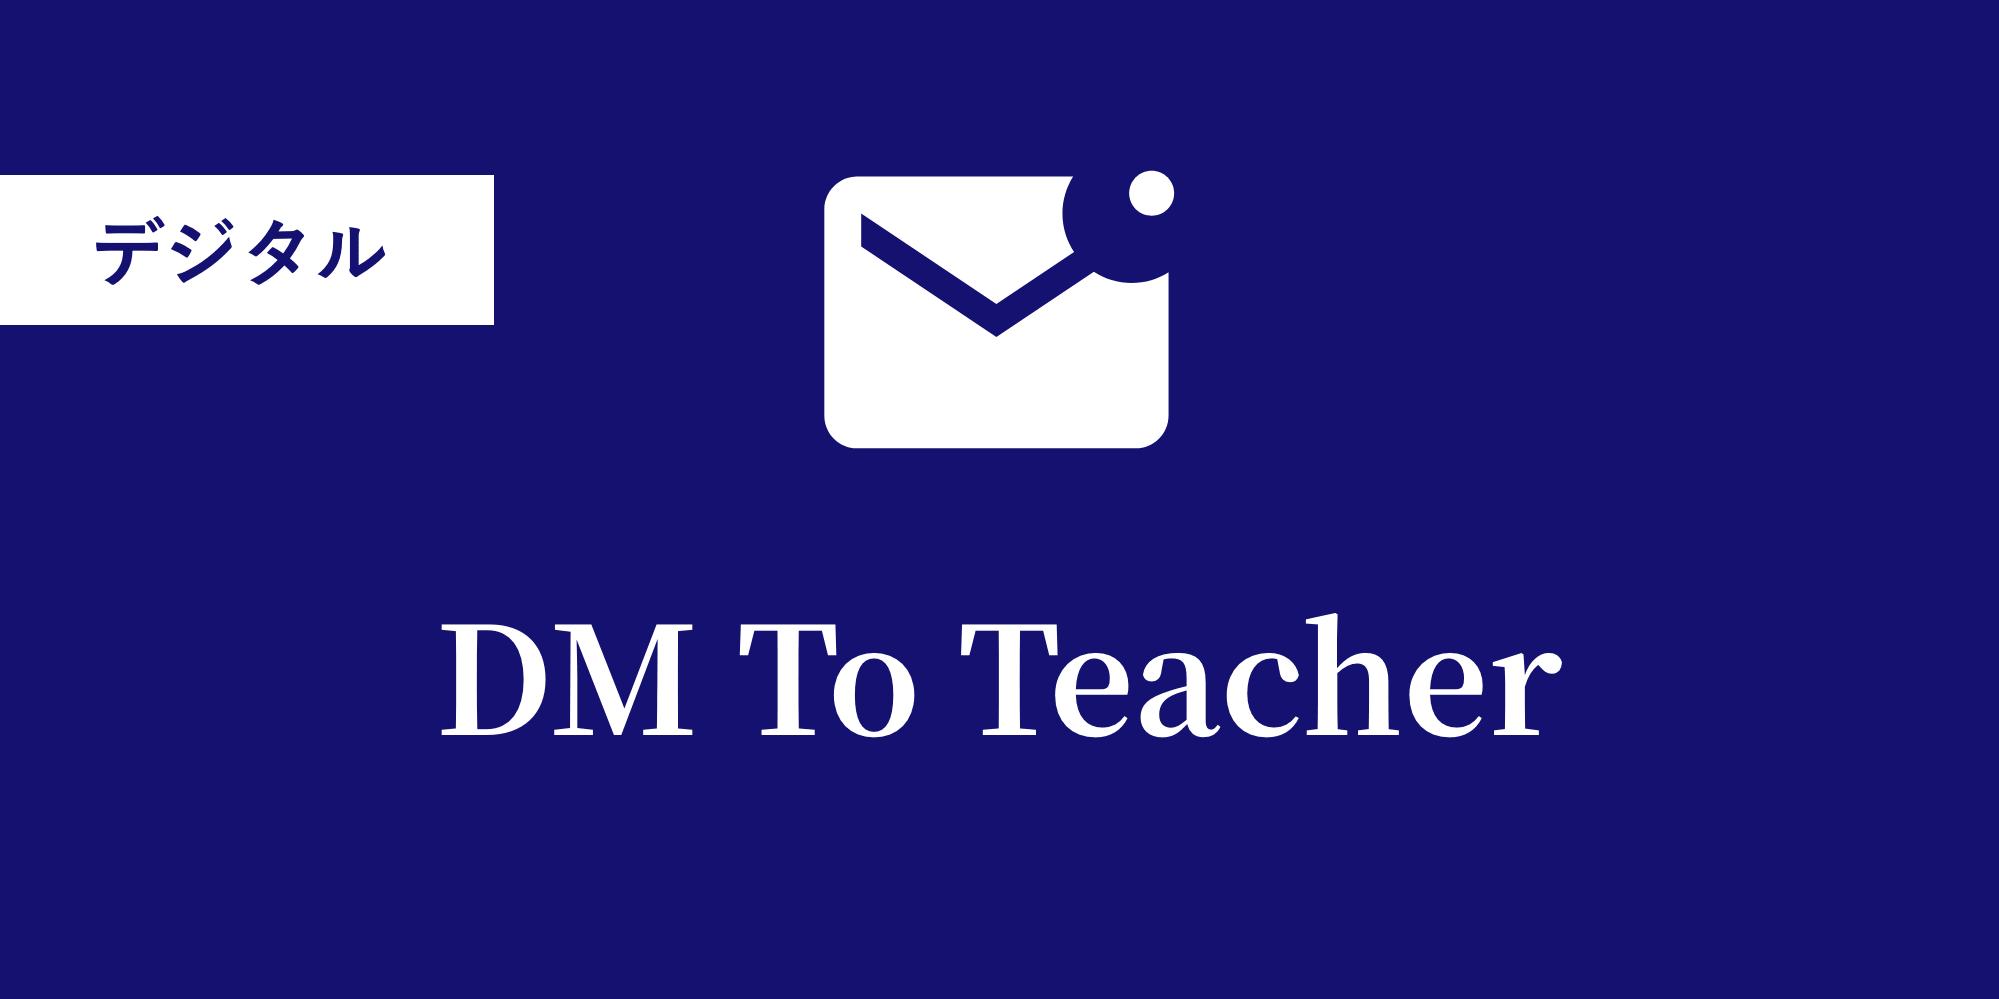 DM To Teacher